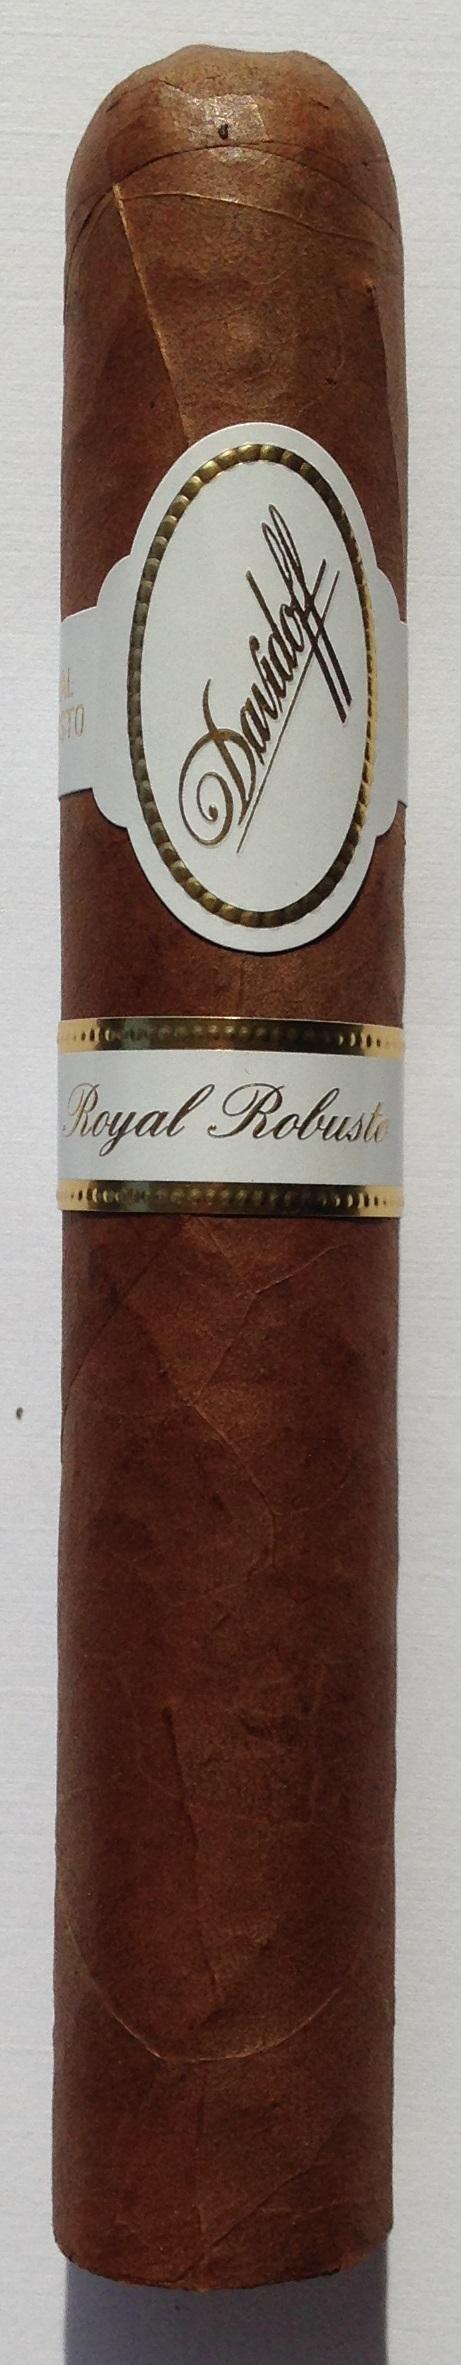 Cigar Review: Davidoff Royal Robusto - Leaf Enthusiast ...